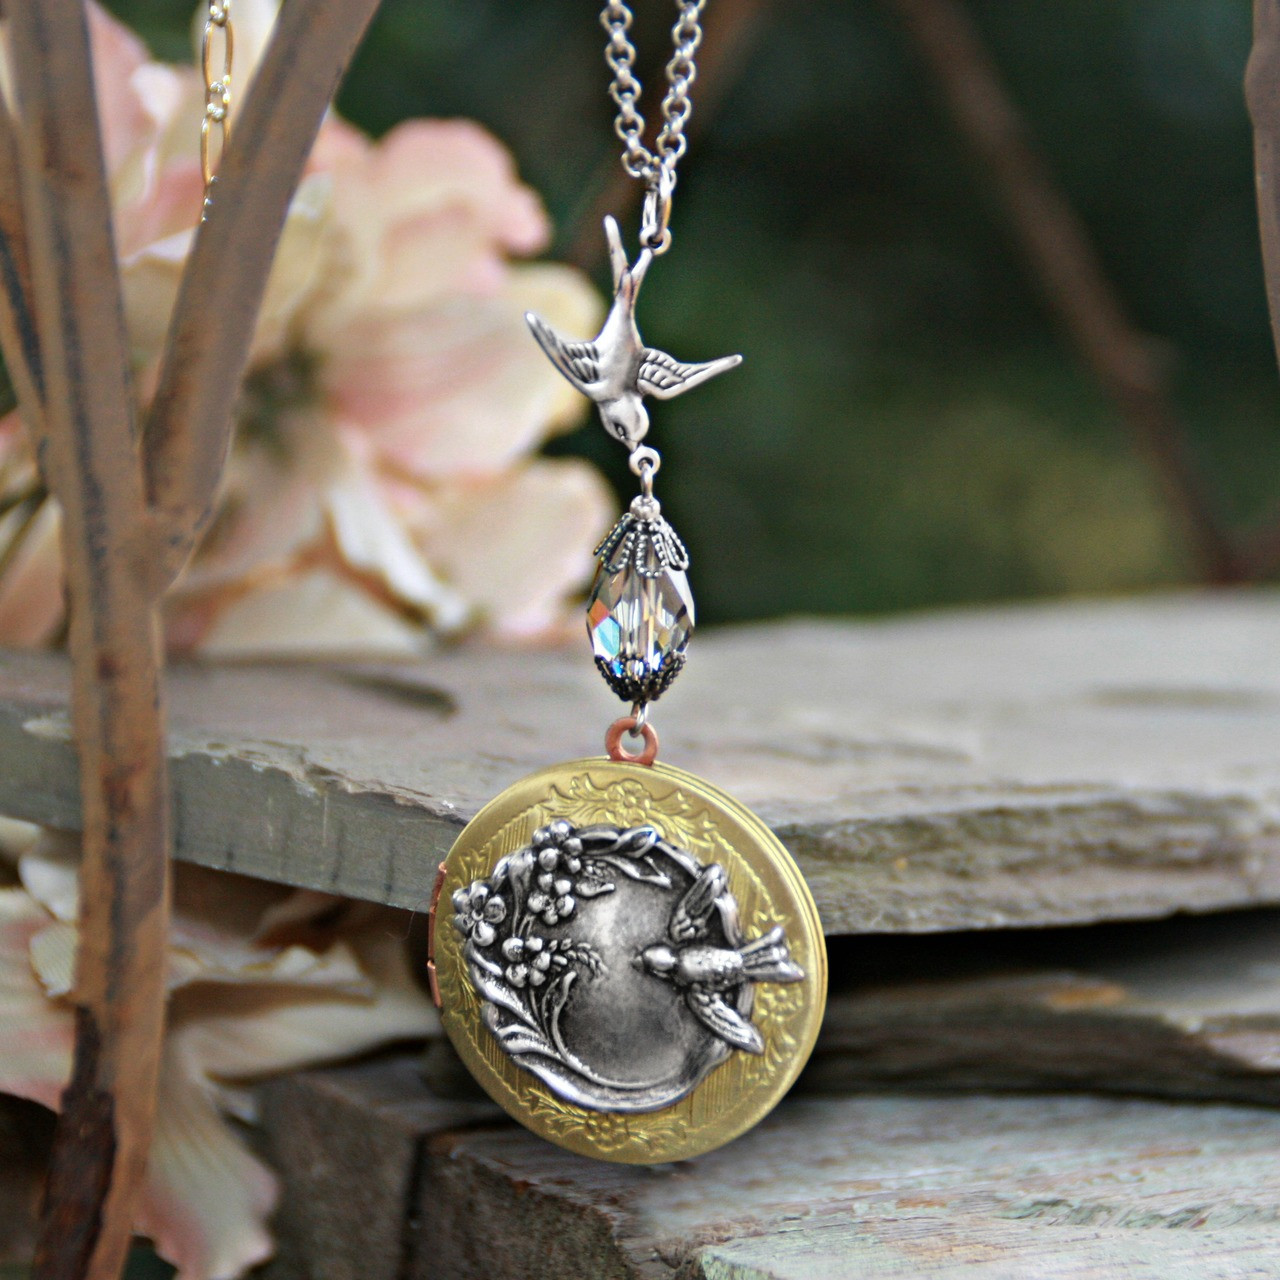 IN-641  Vintage Bird Locket Necklace